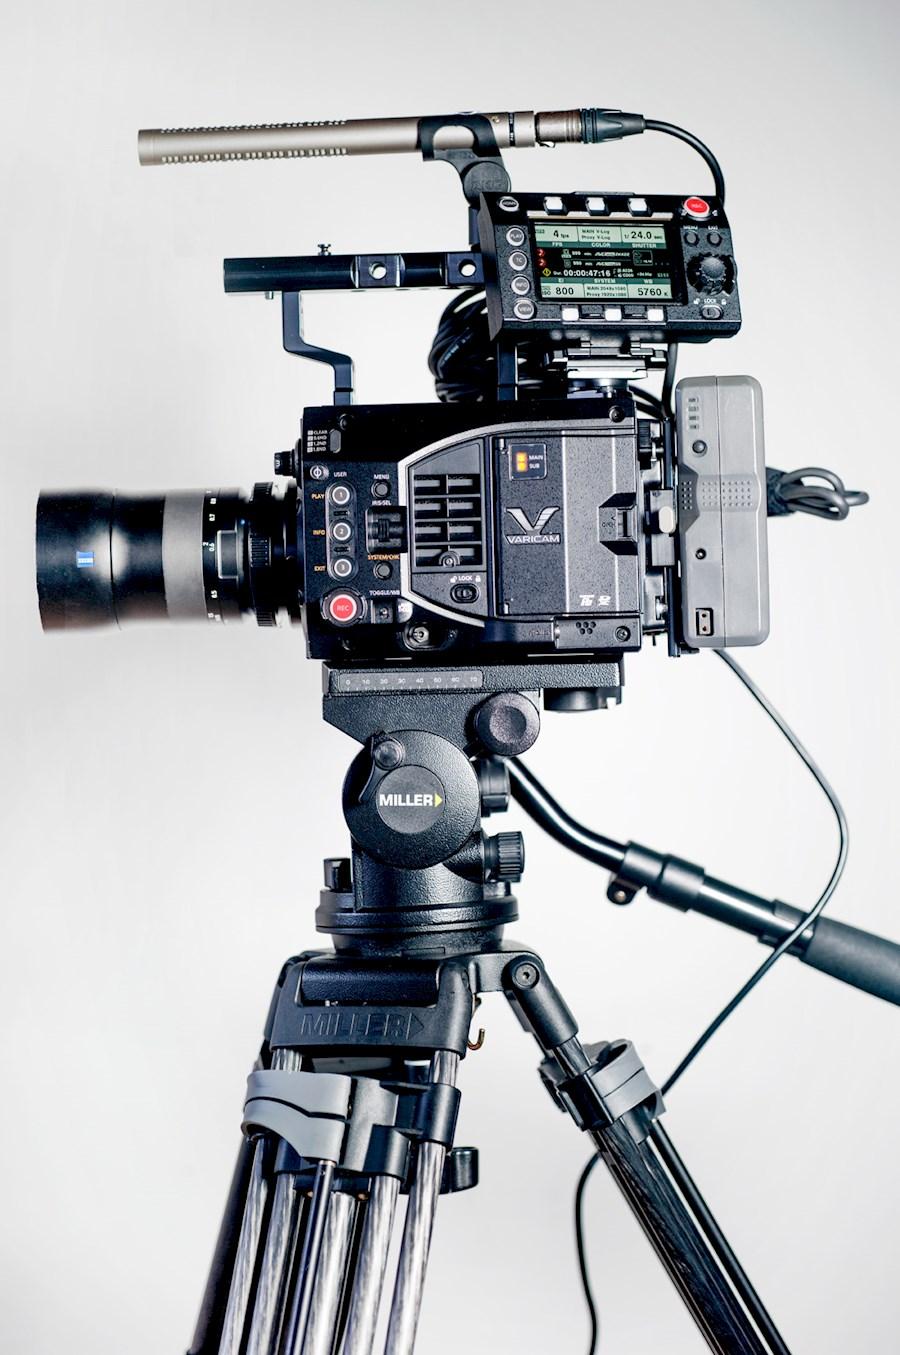 Rent a Panasonic VariCam LT Cinema camera FULL SET in Afferden from Johan